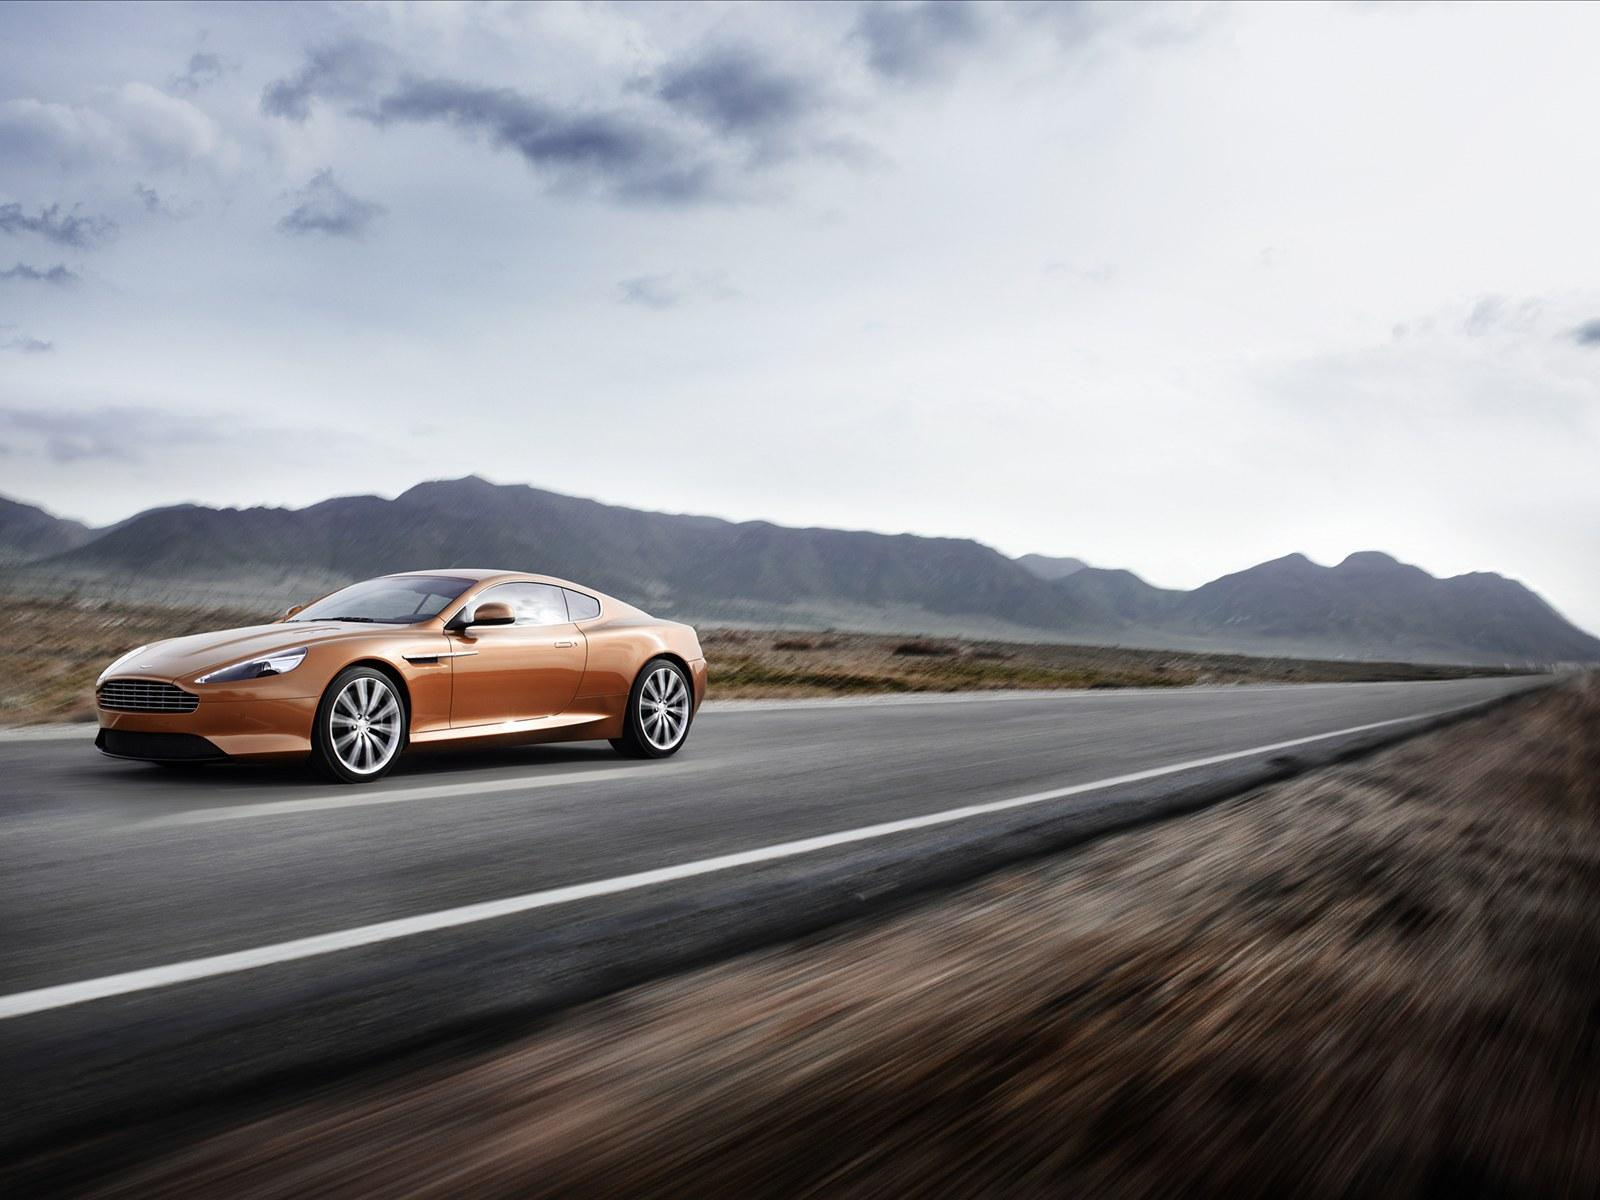 Aston Martin Virage 2011 Photo - 1